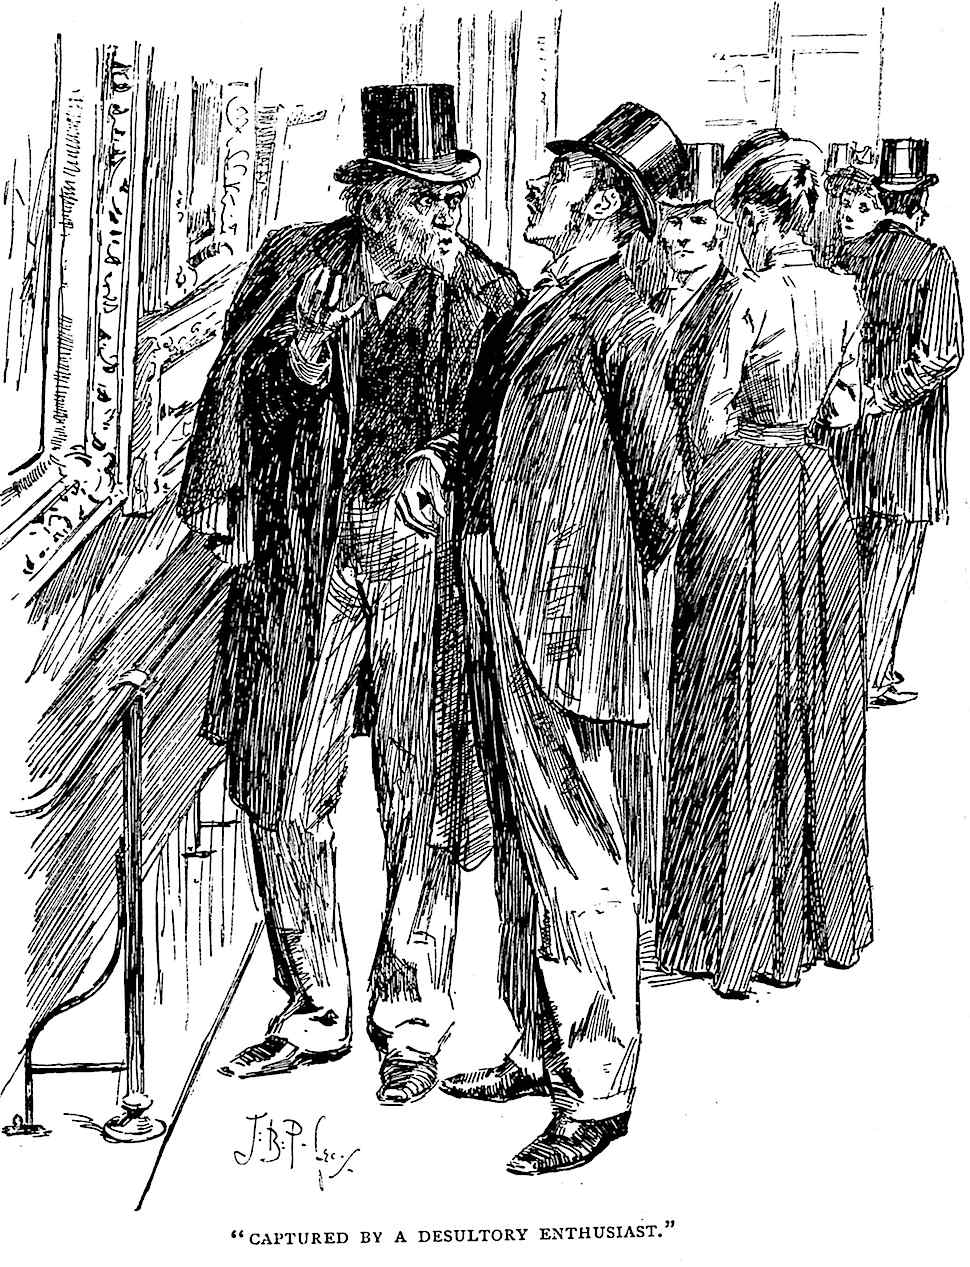 a J. Bernard Partridge cartoon, Captured by a desultory enthusiast in an art gallery